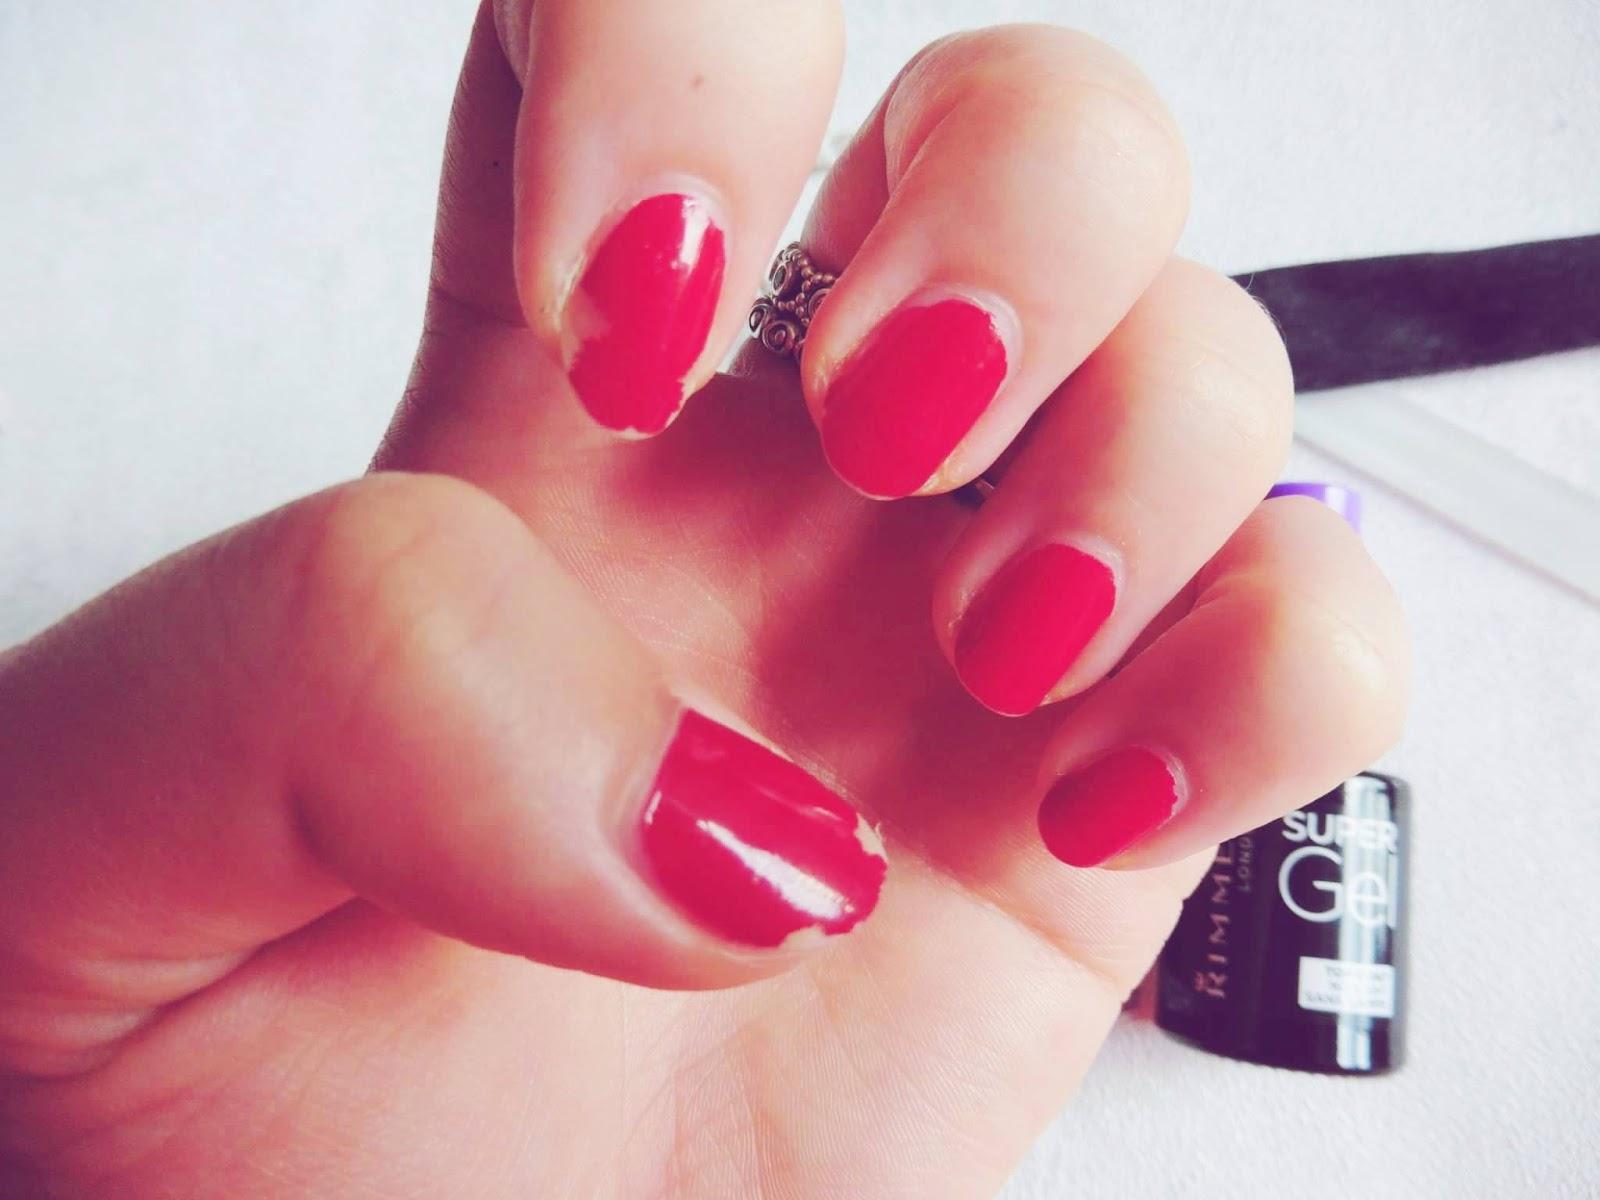 lebellelavie - The Rimmel Super Gel nail polish